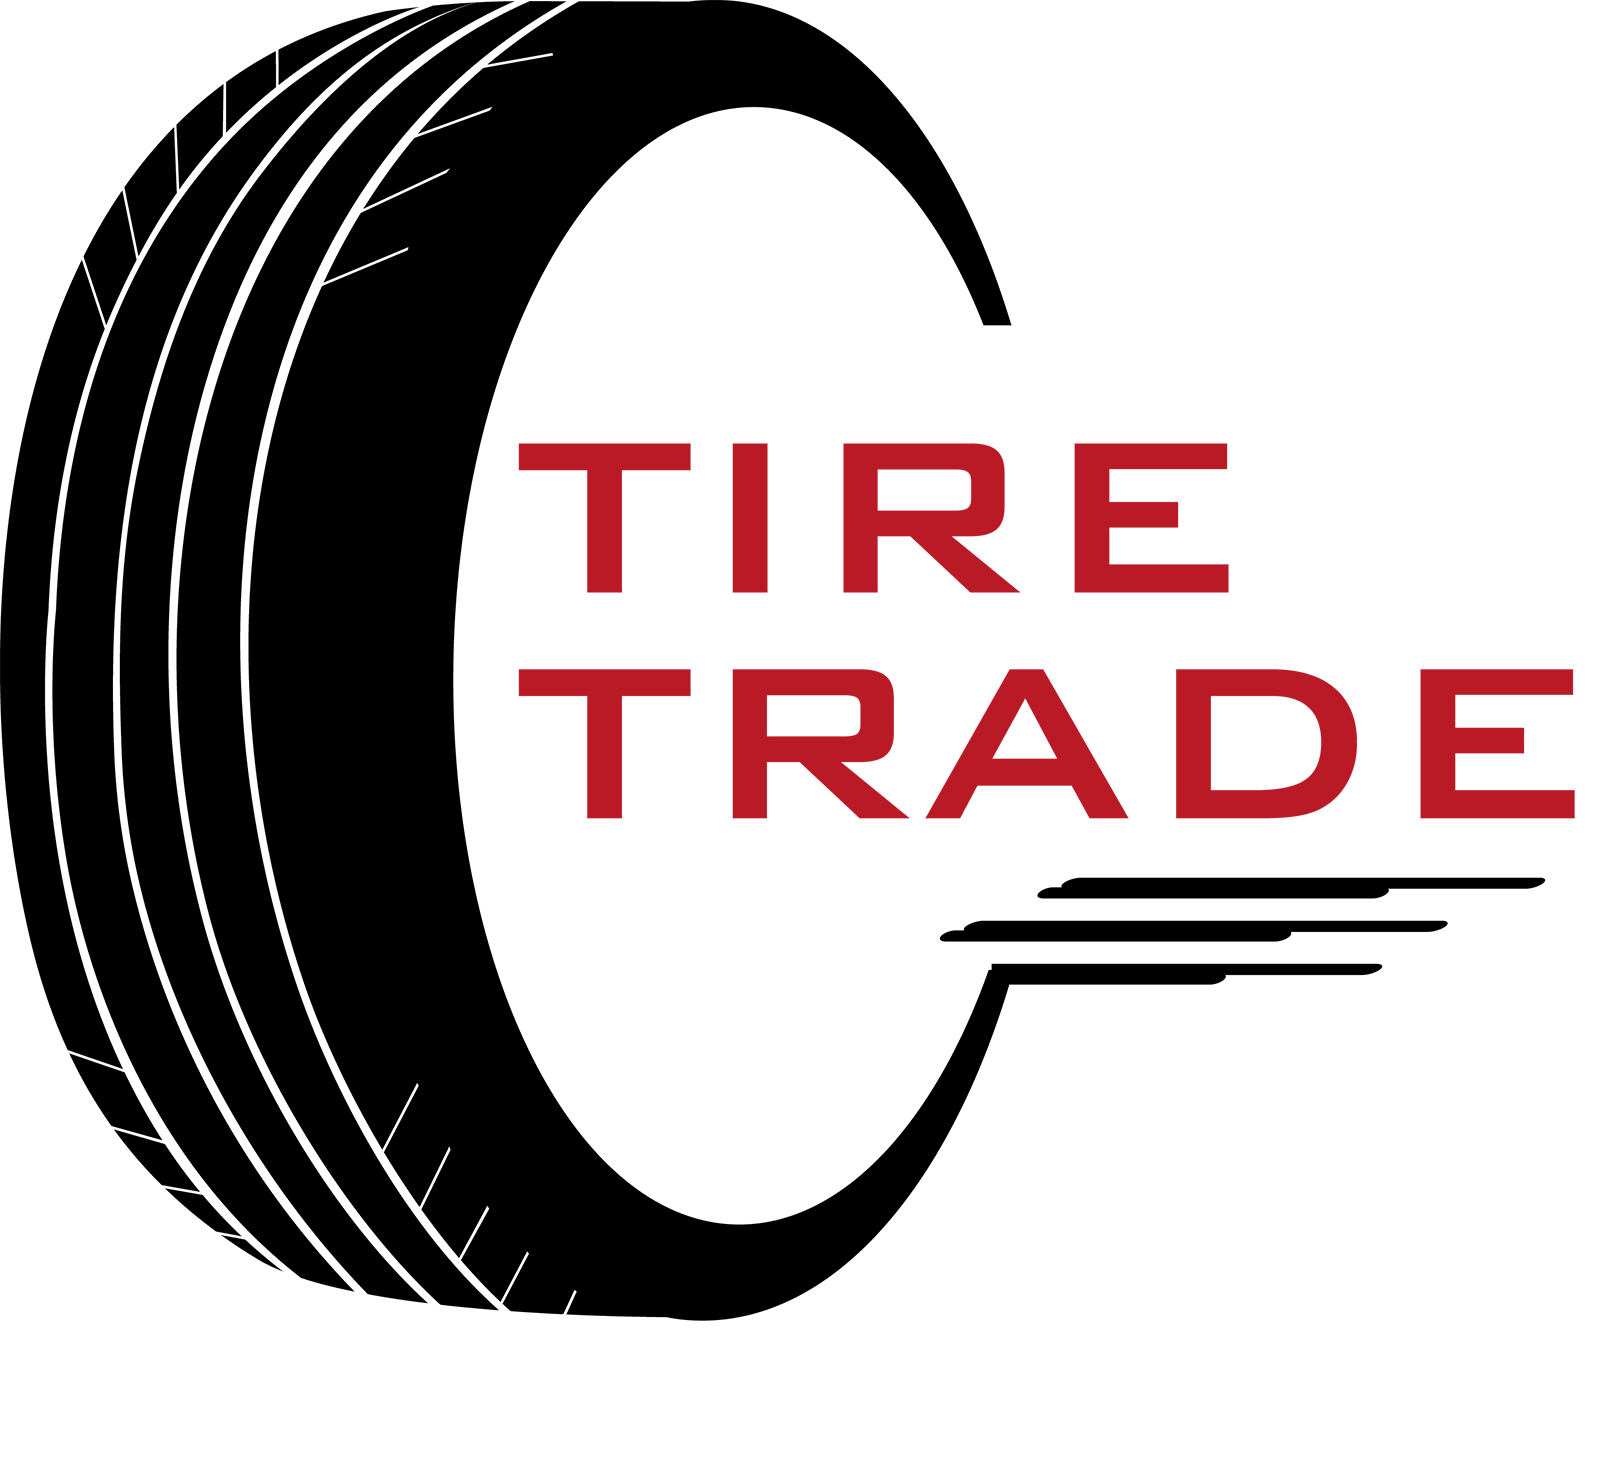 tire trade morris ishak logo[20704]